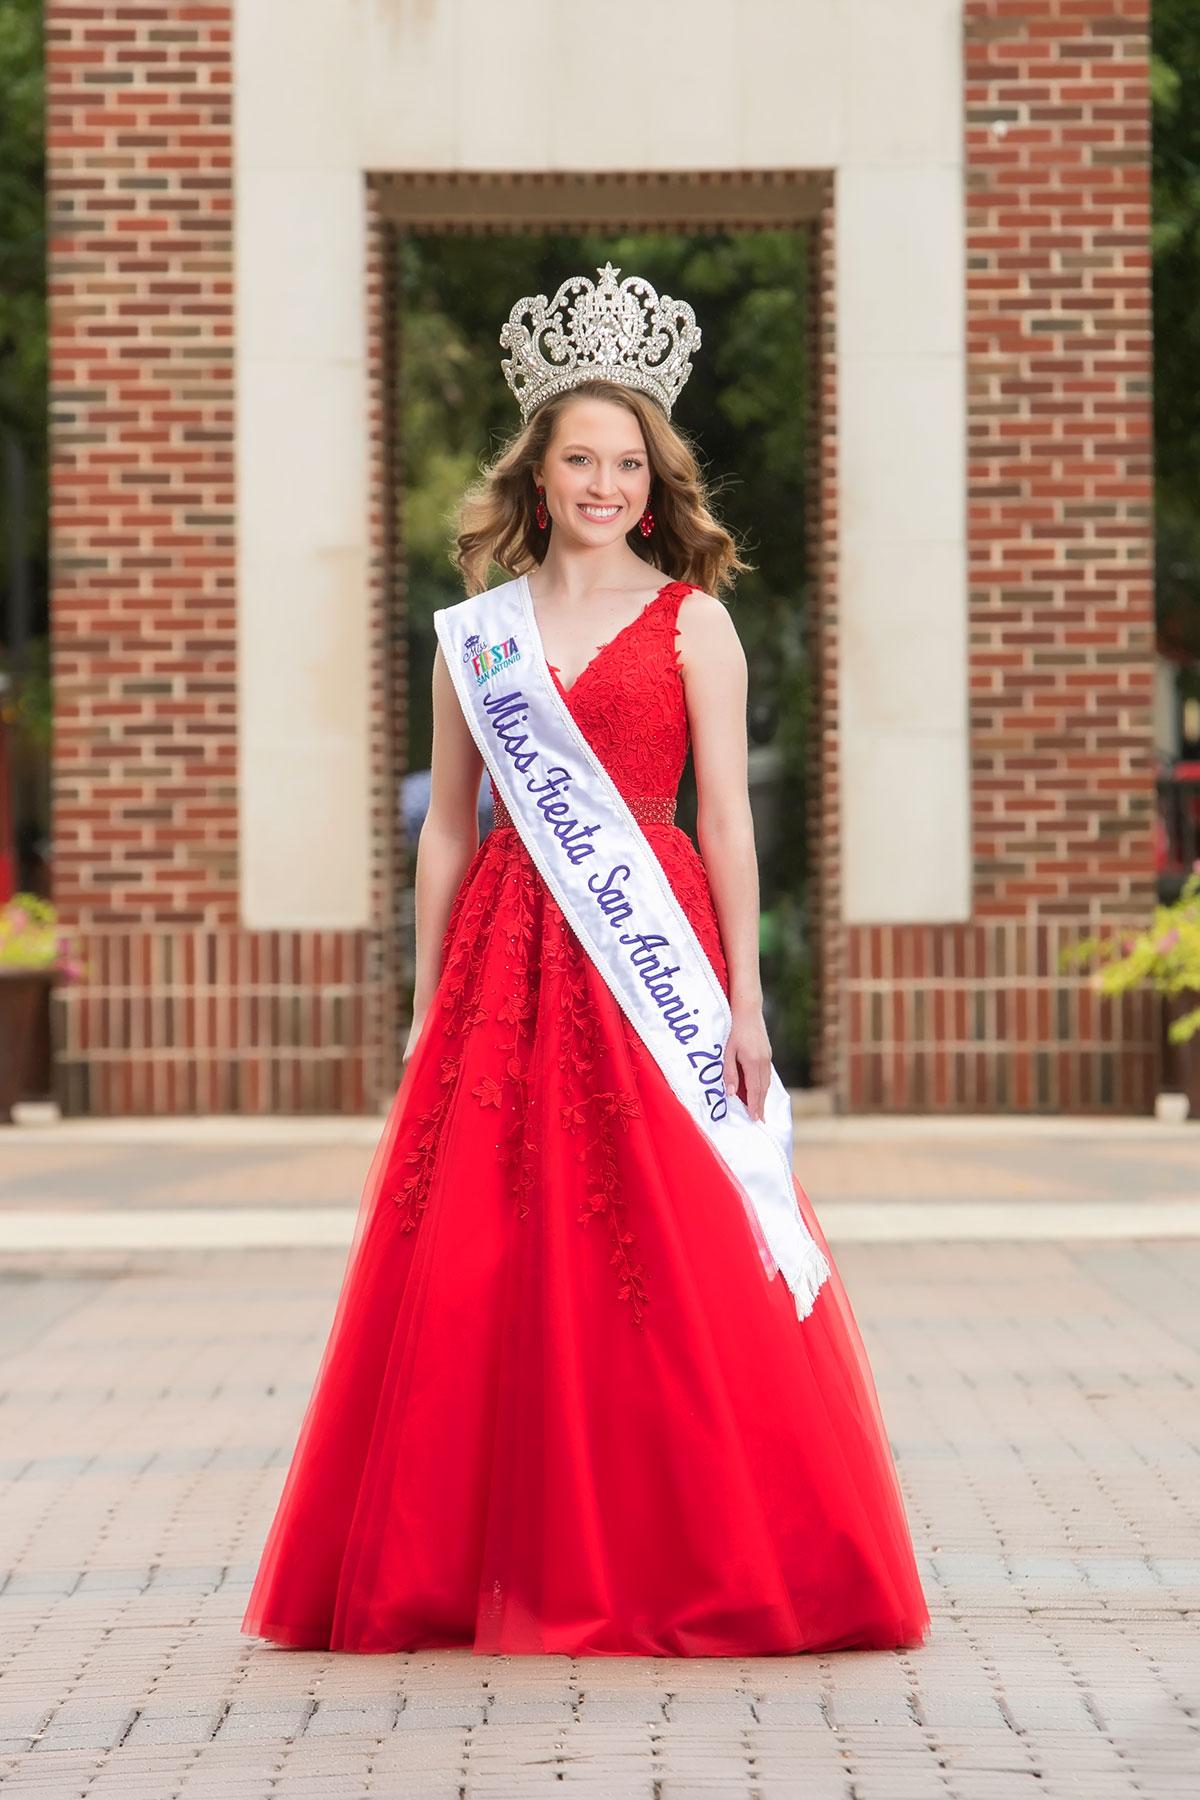 Miss Fiesta® San Antonio 2020-2021 Continues Community Service Project for Fiesta 2021